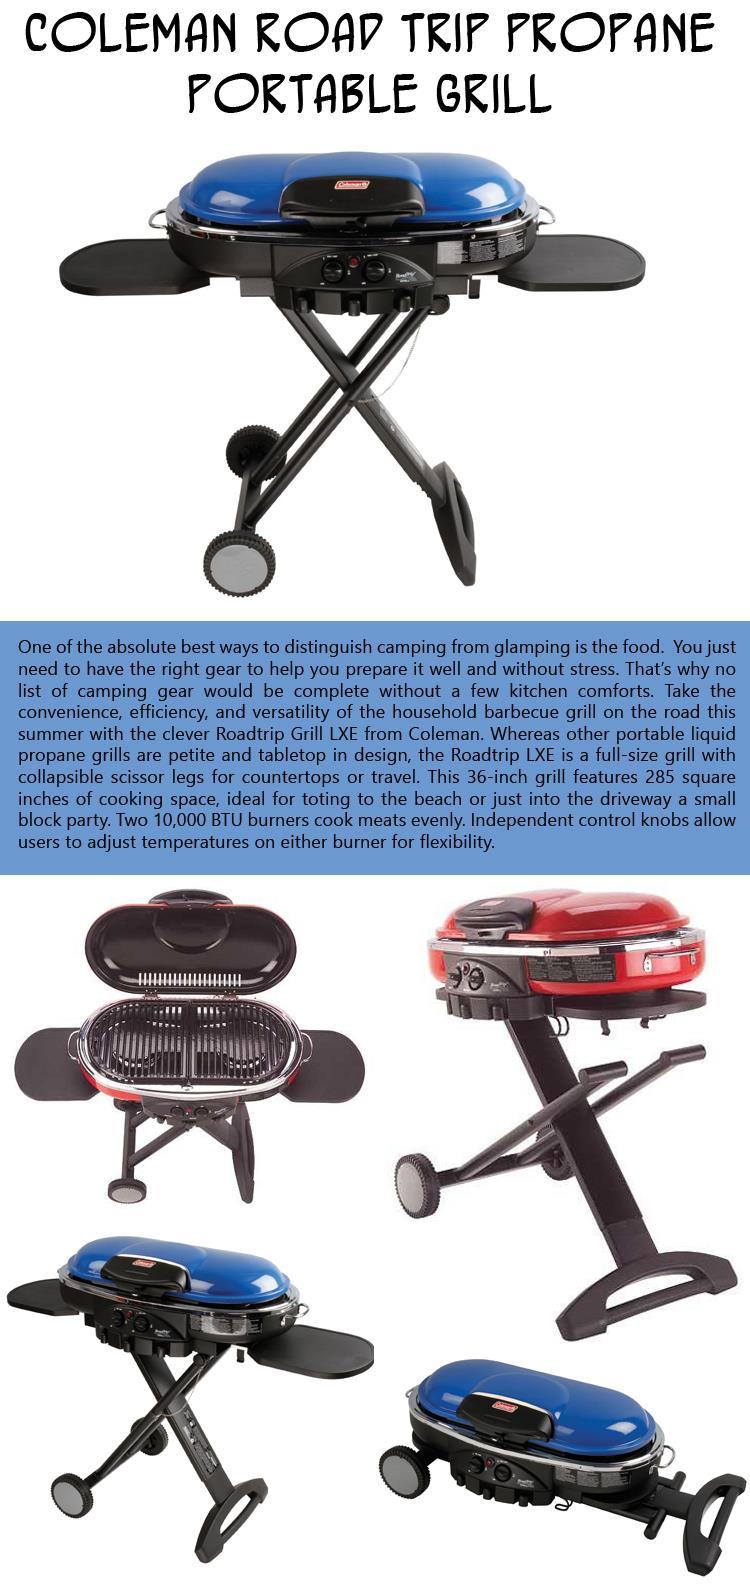 5- Coleman Road Trip Propane Portable Grill